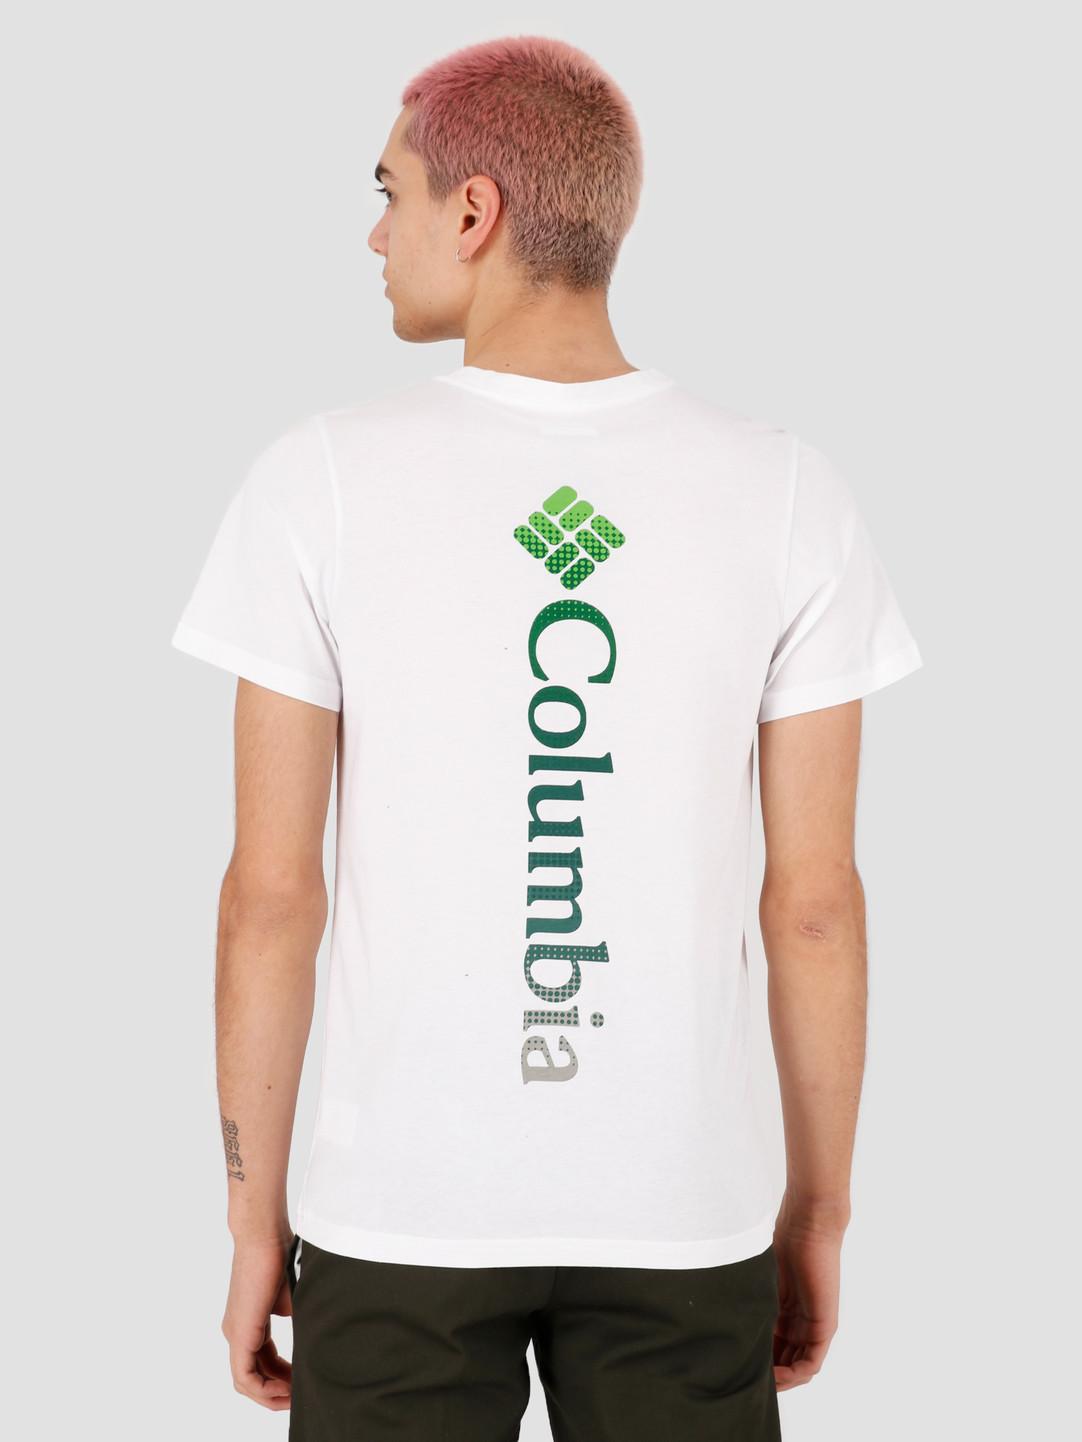 Columbia Columbia Rapid Ridge Back Graphic T-shirt White CSC Textu 1888863100